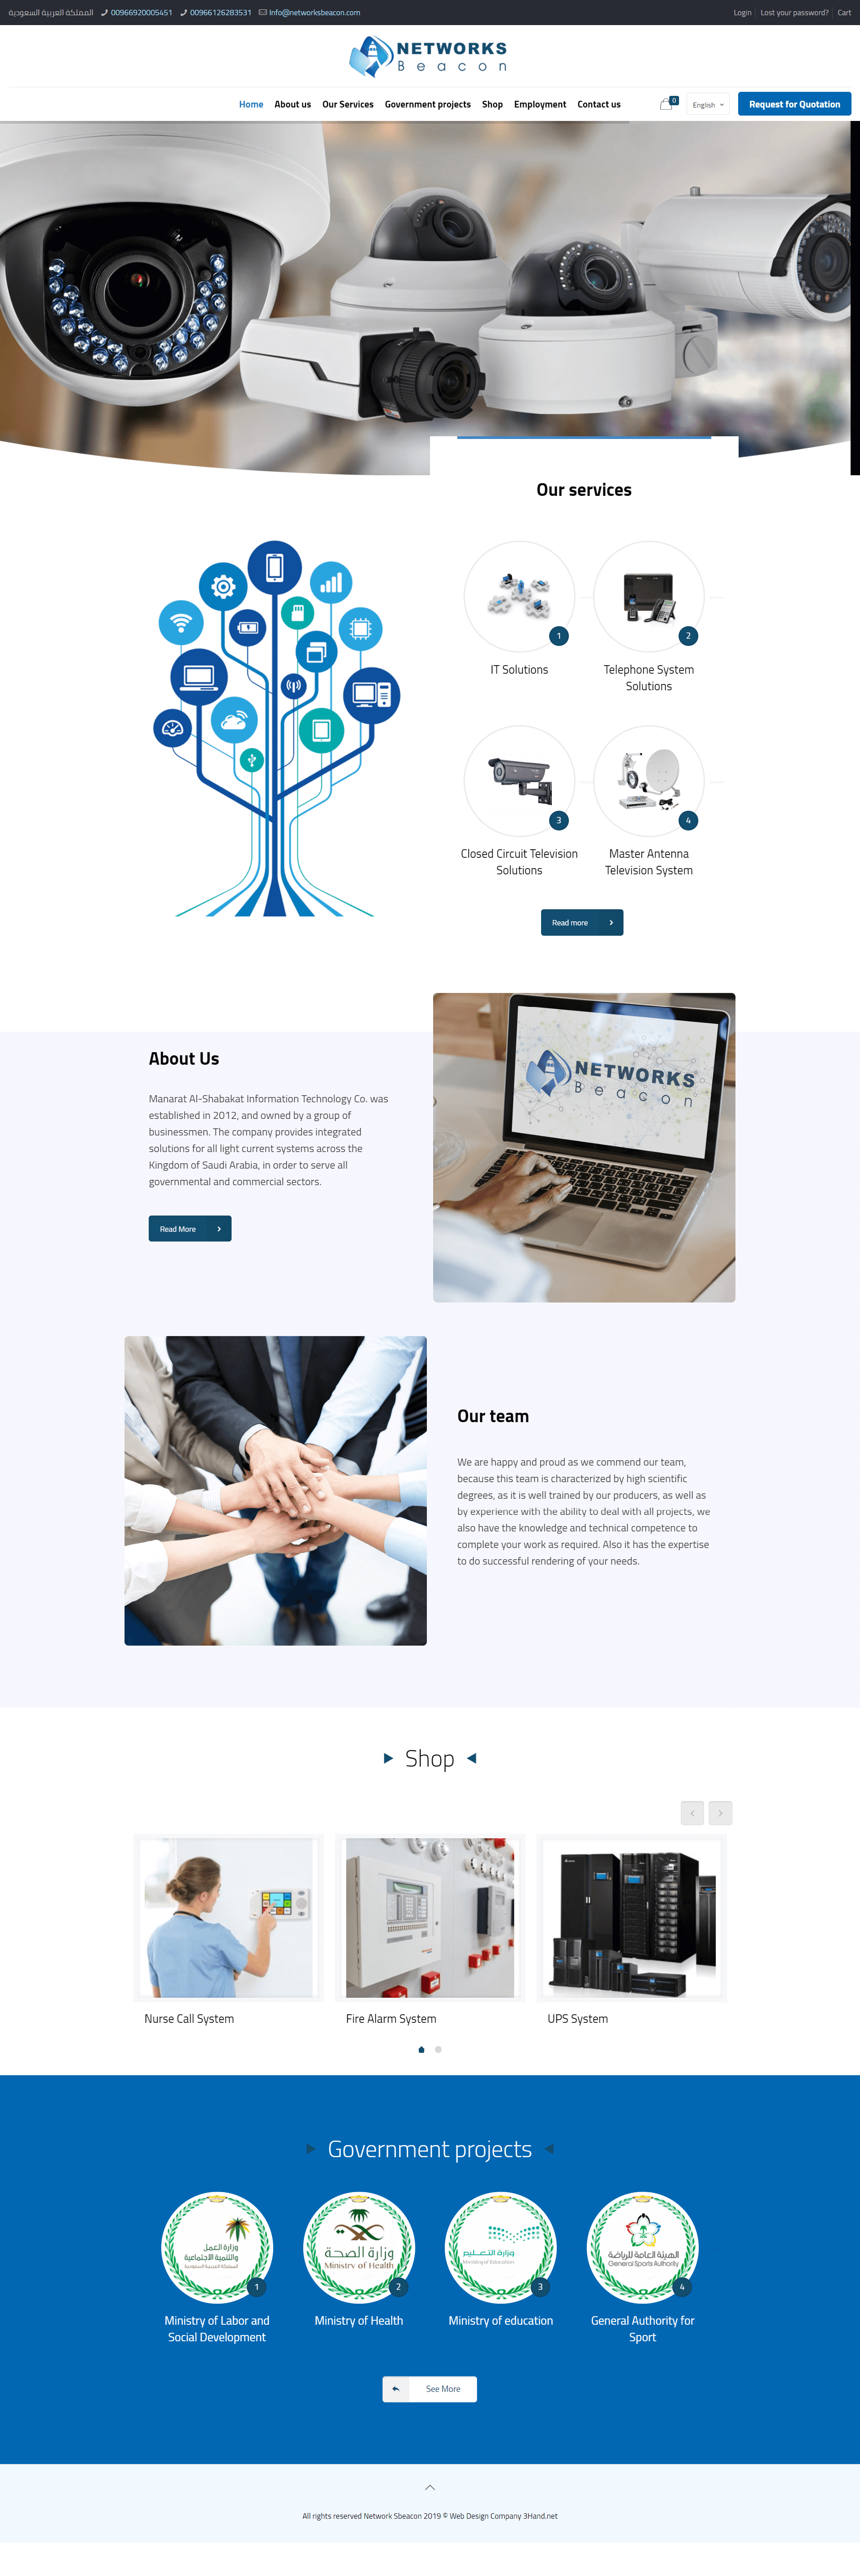 networksbeacon – موقع ووردبريس عربي آخر (1)